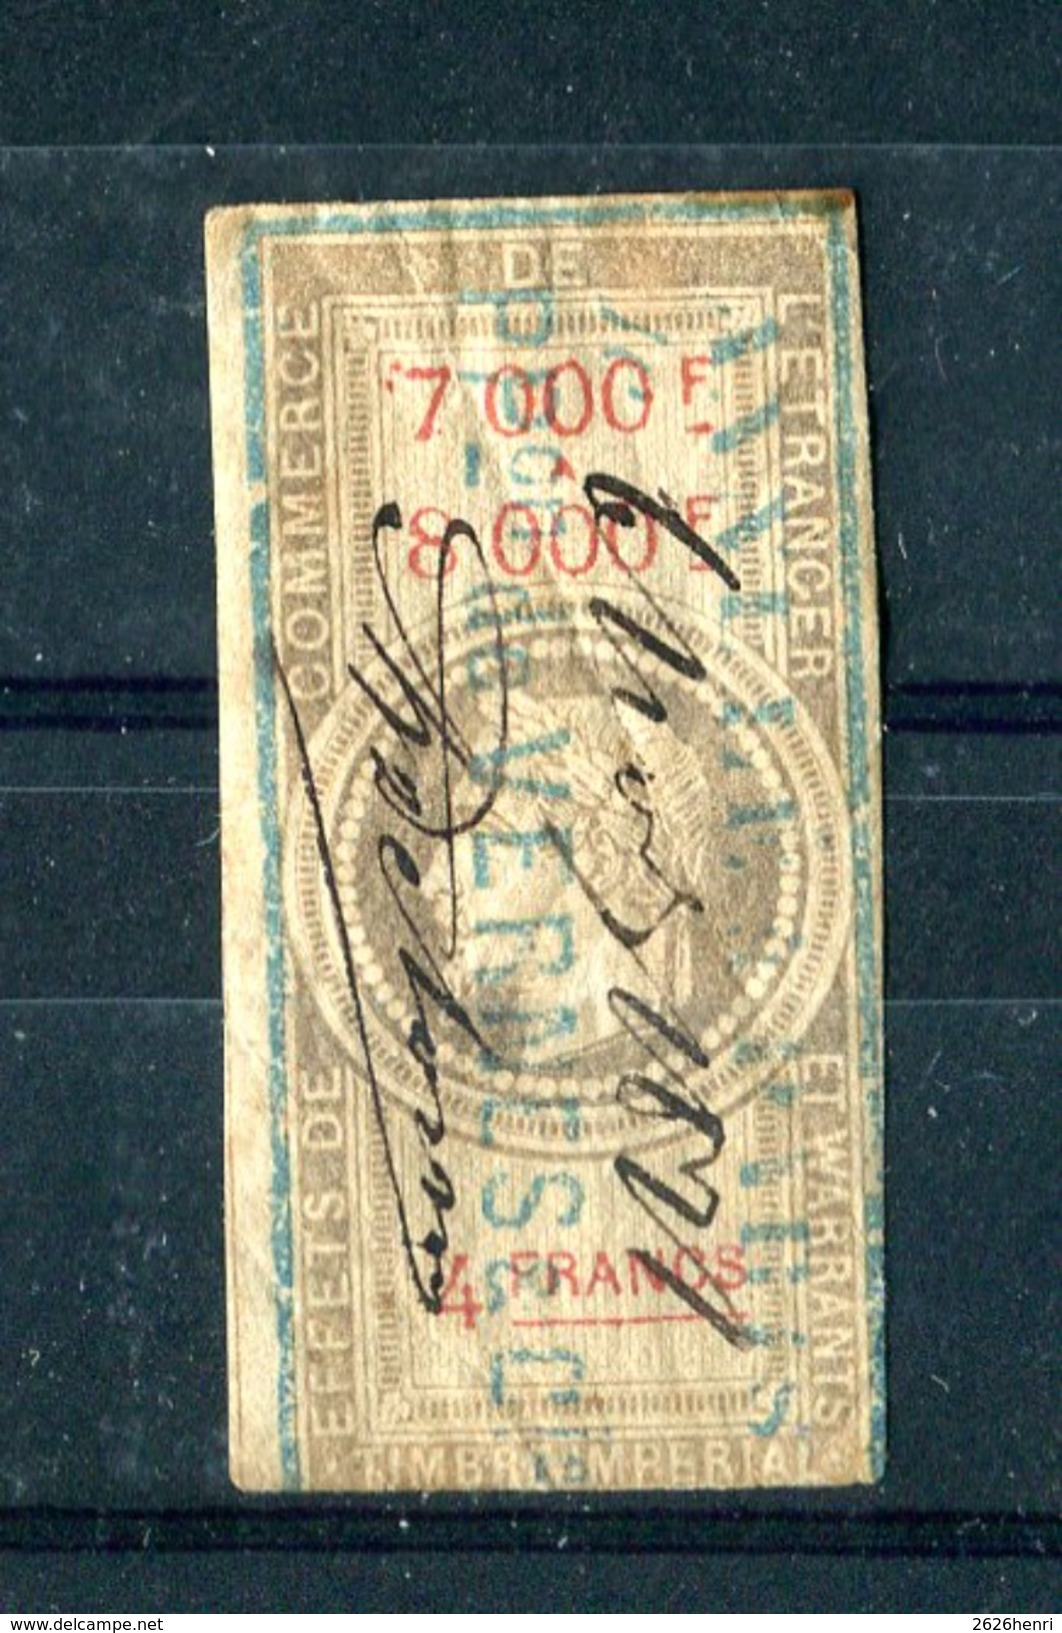 Timbre Fiscal  Napoleon, 4 Francs Effet De Commerce 1864, #38 - Fiscaux